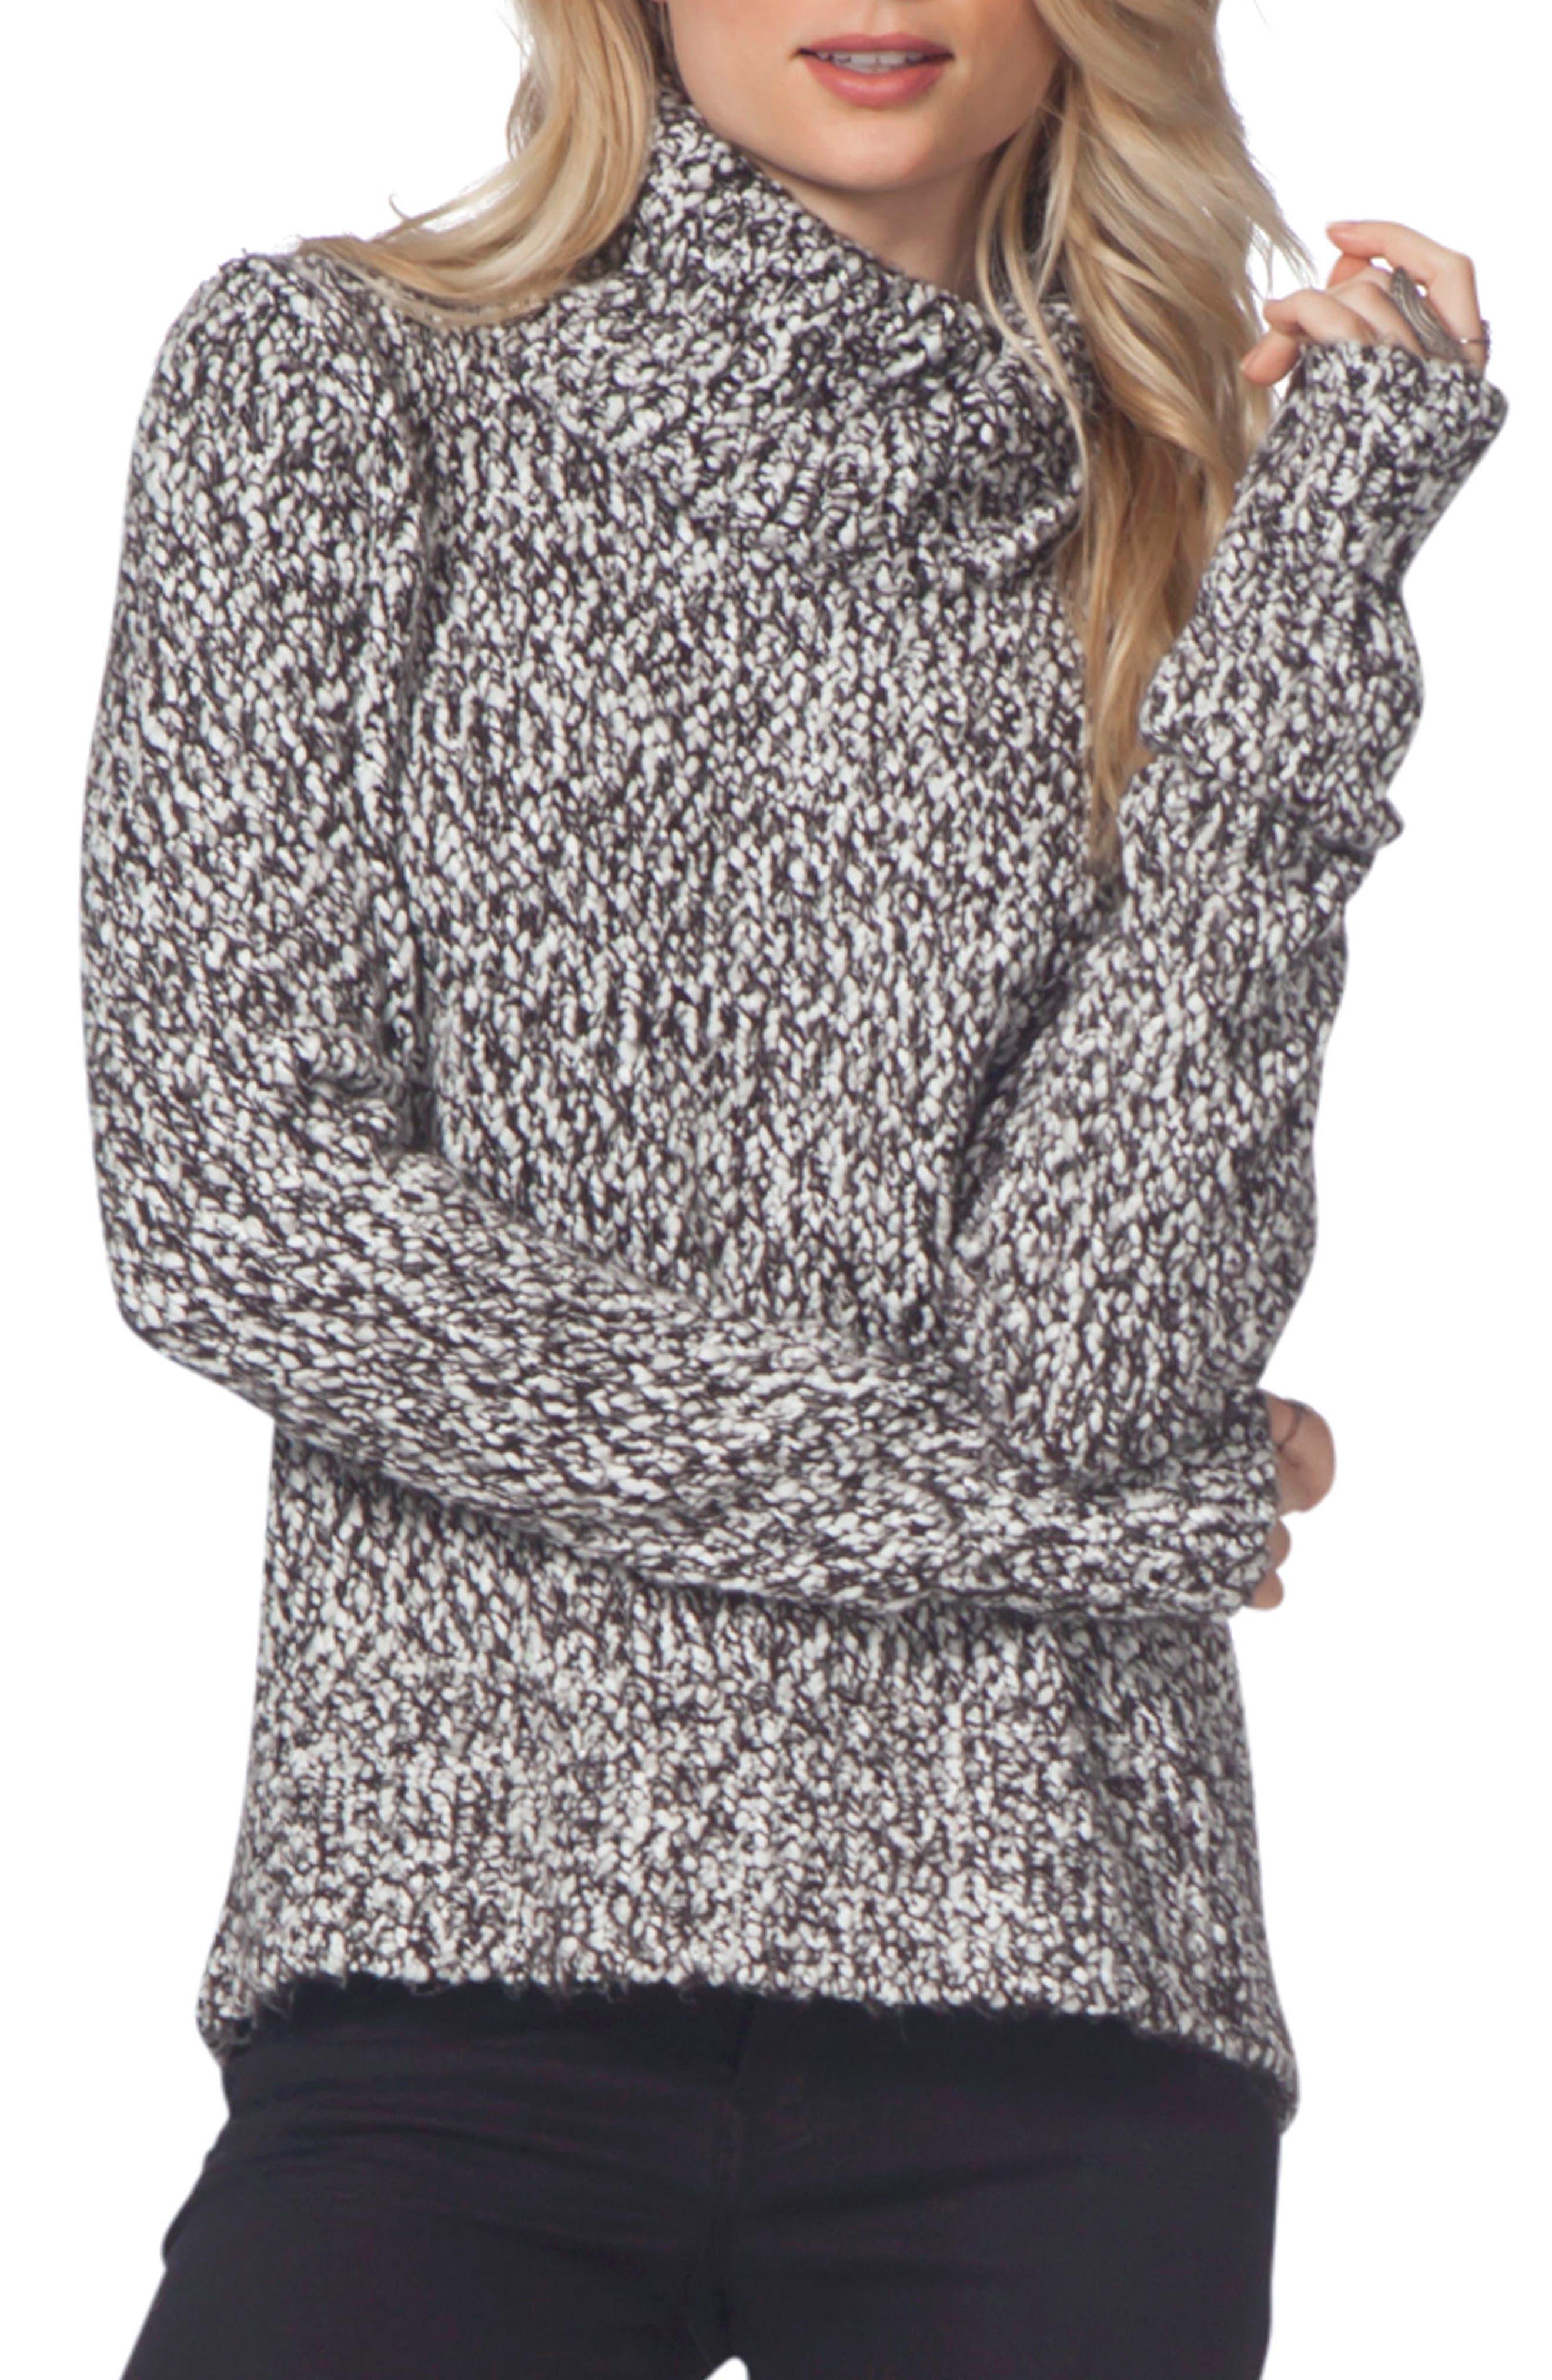 Sailor Turtleneck Sweater,                             Main thumbnail 1, color,                             Black/ White